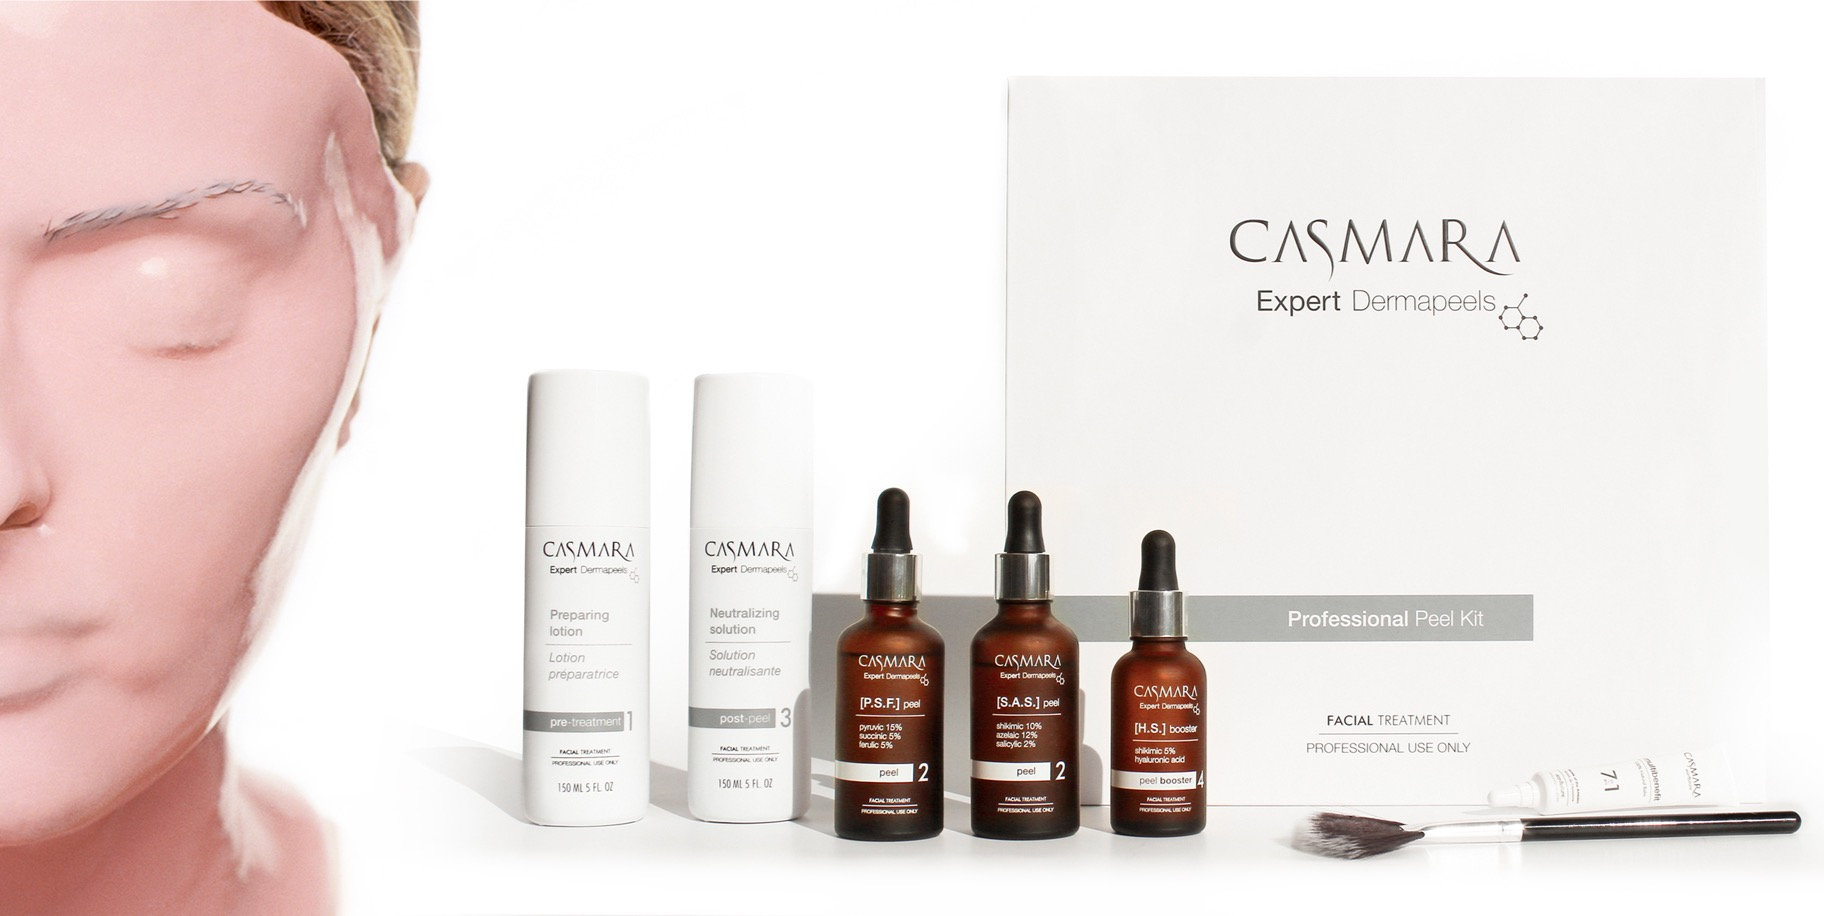 Casmara Dermapeel behandeling